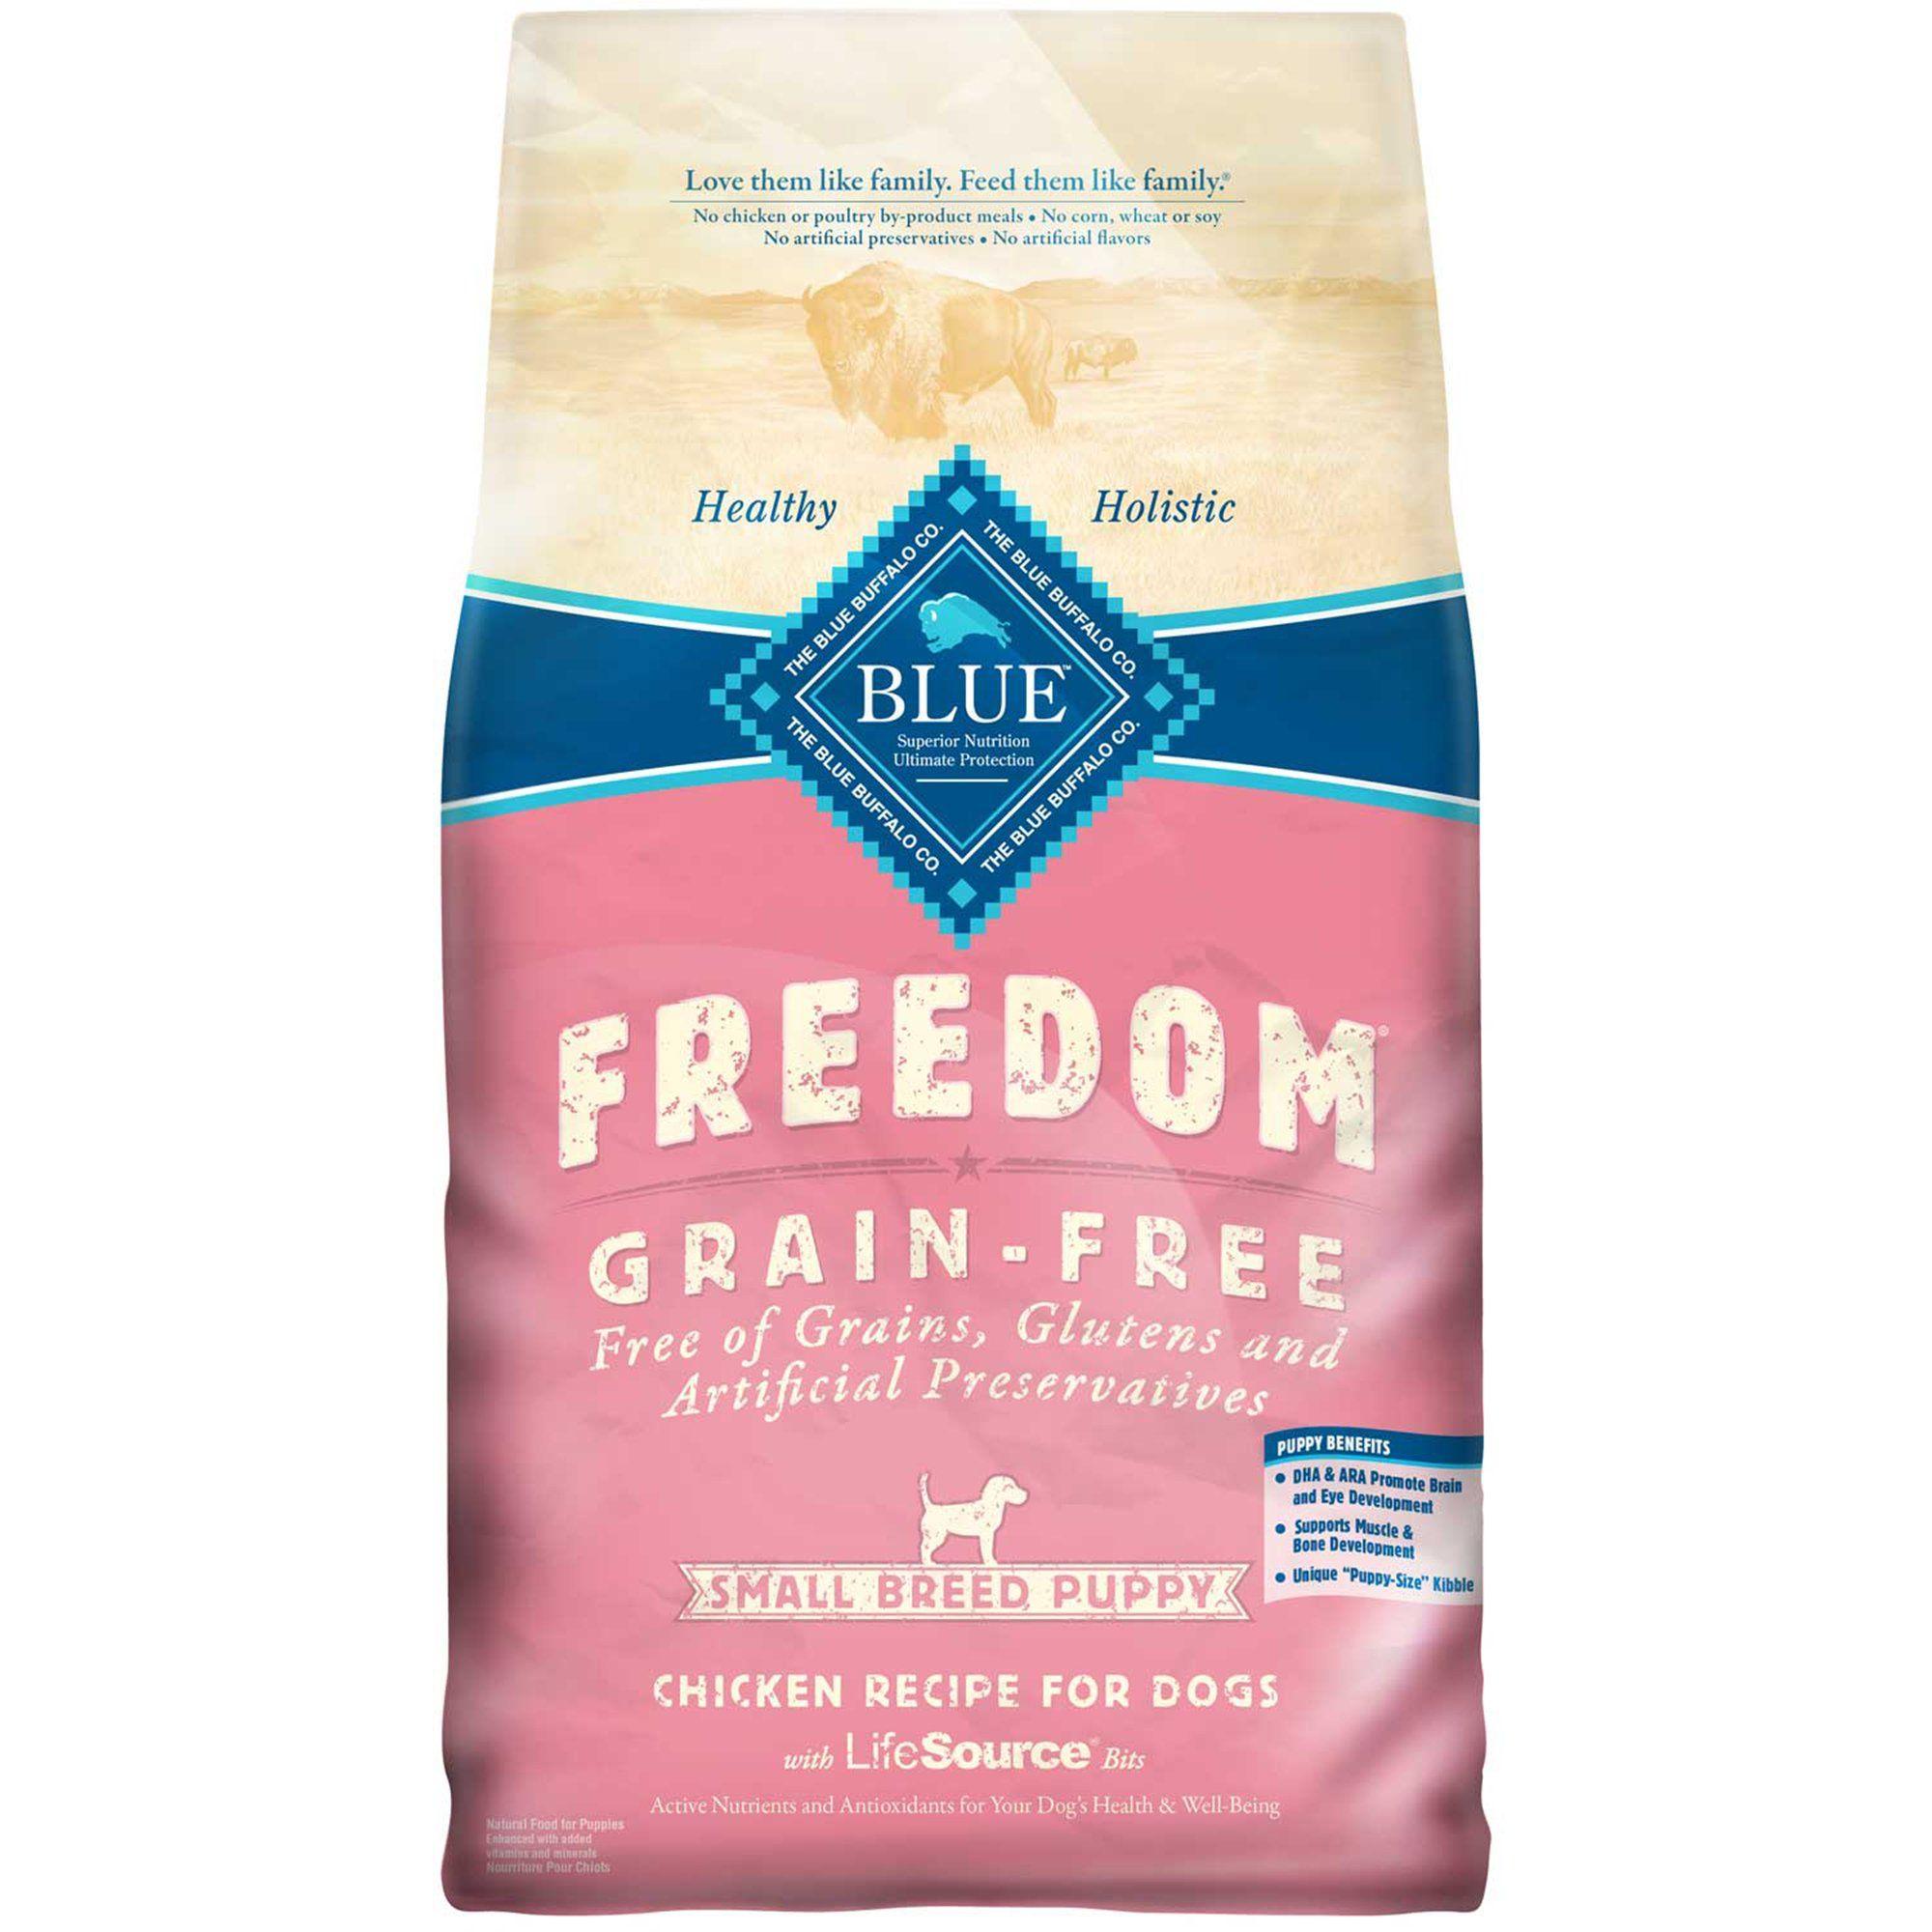 Blue Buffalo Blue Freedom Grain Free Small Breed Puppy Chicken Recipe Dry Dog Food 4 Lbs Petco Freeze Dried Dog Food Puppy Food Dry Dog Food